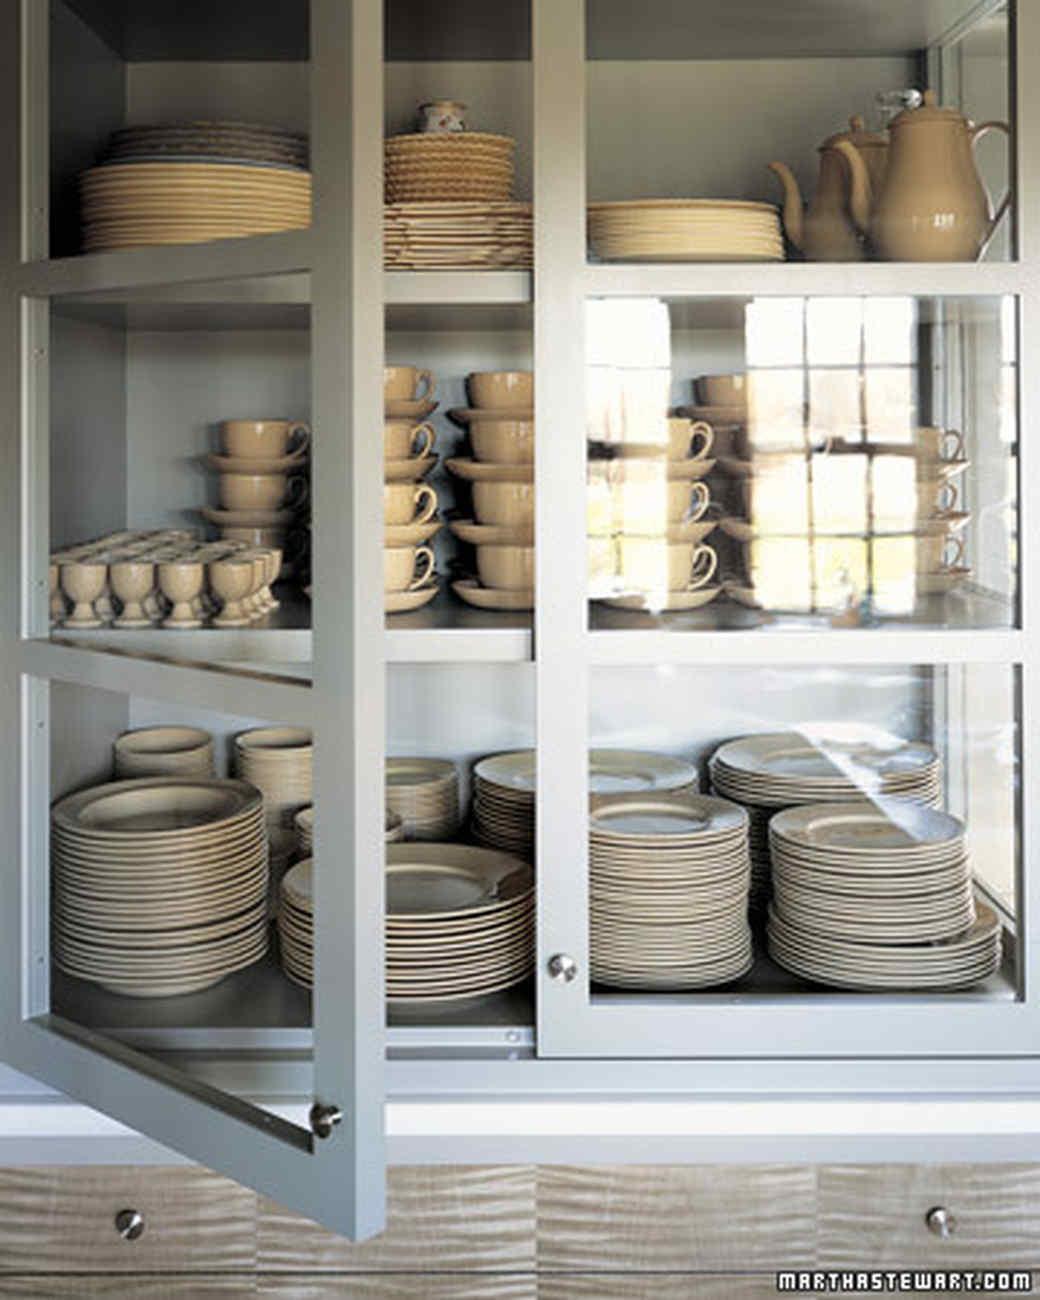 mla102028_0906_cupboard.jpg